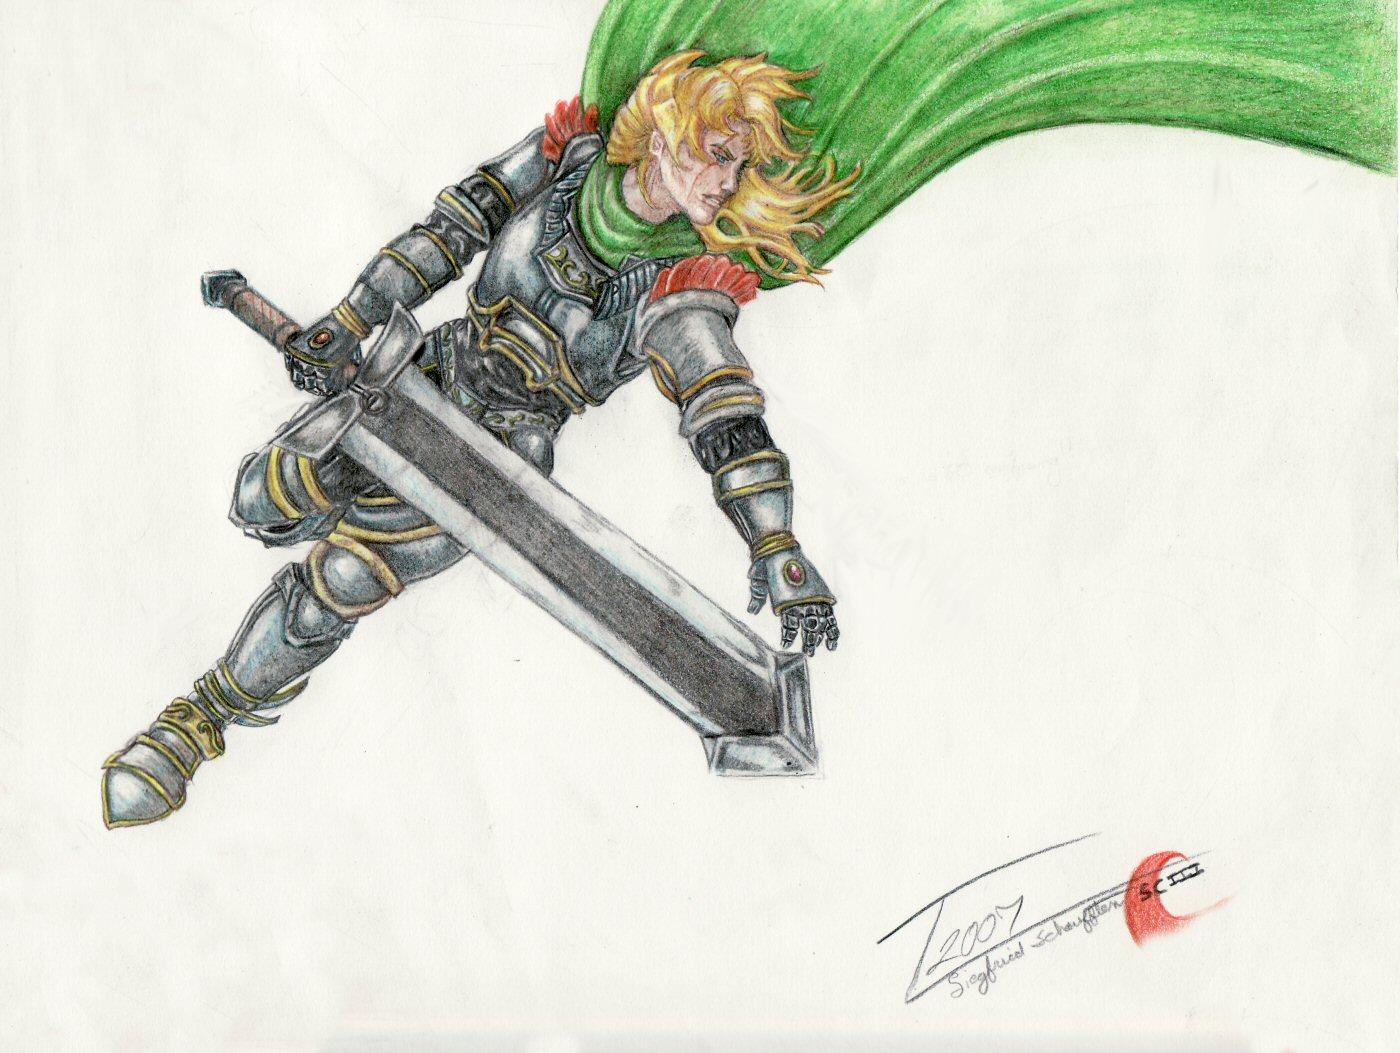 Siegfried-Mid Flight by teal27